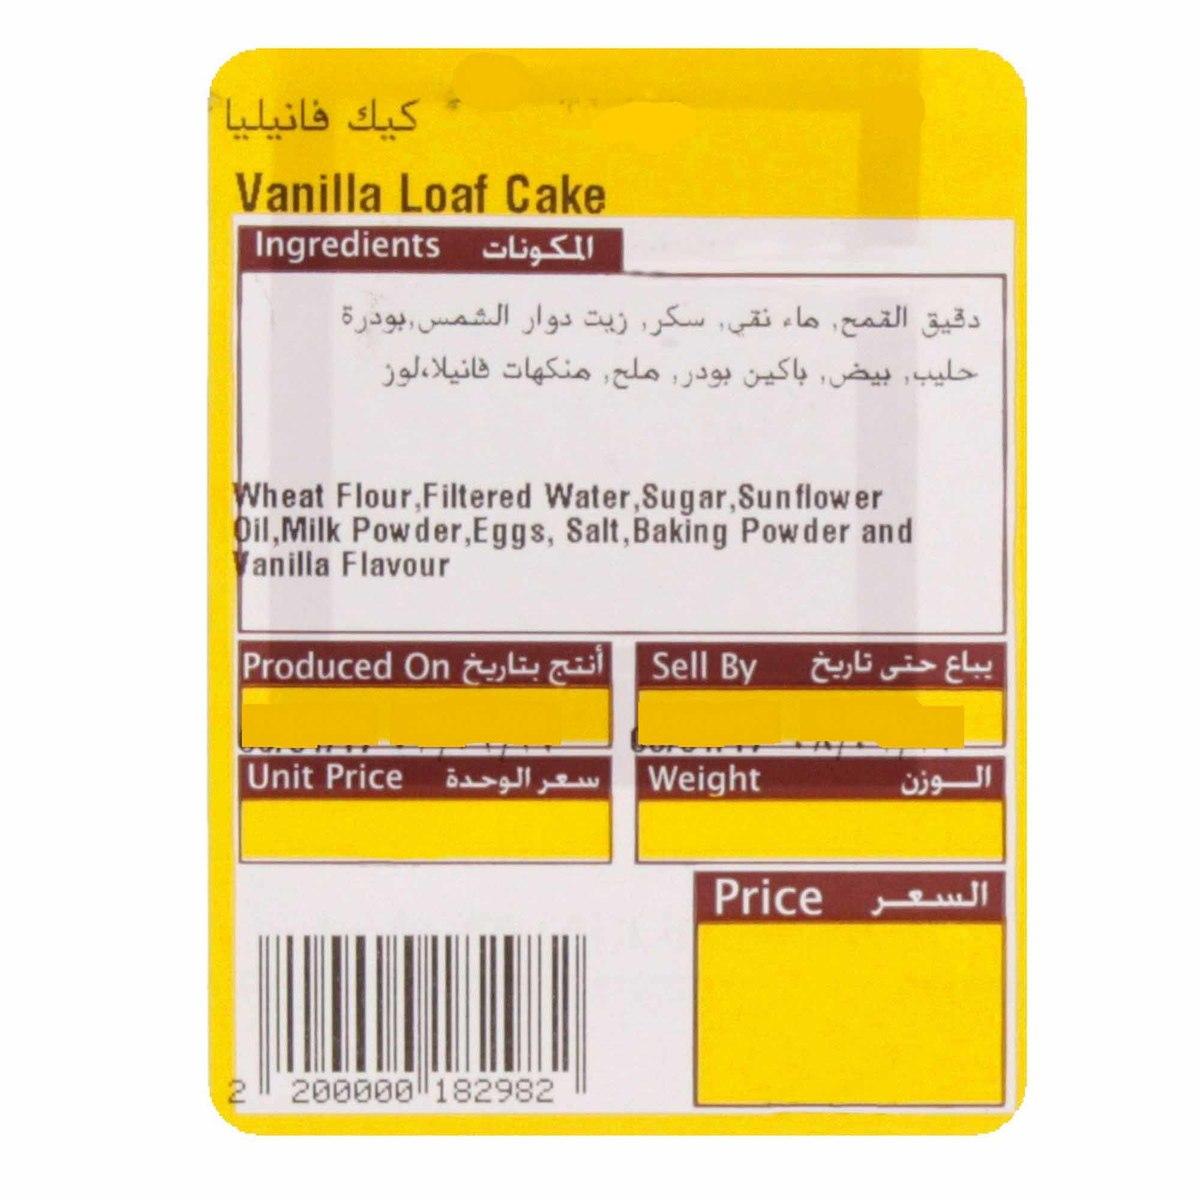 Buy Lulu Vanilla Loaf Cake 1pc - Dry Cakes - Lulu Webstore KSA